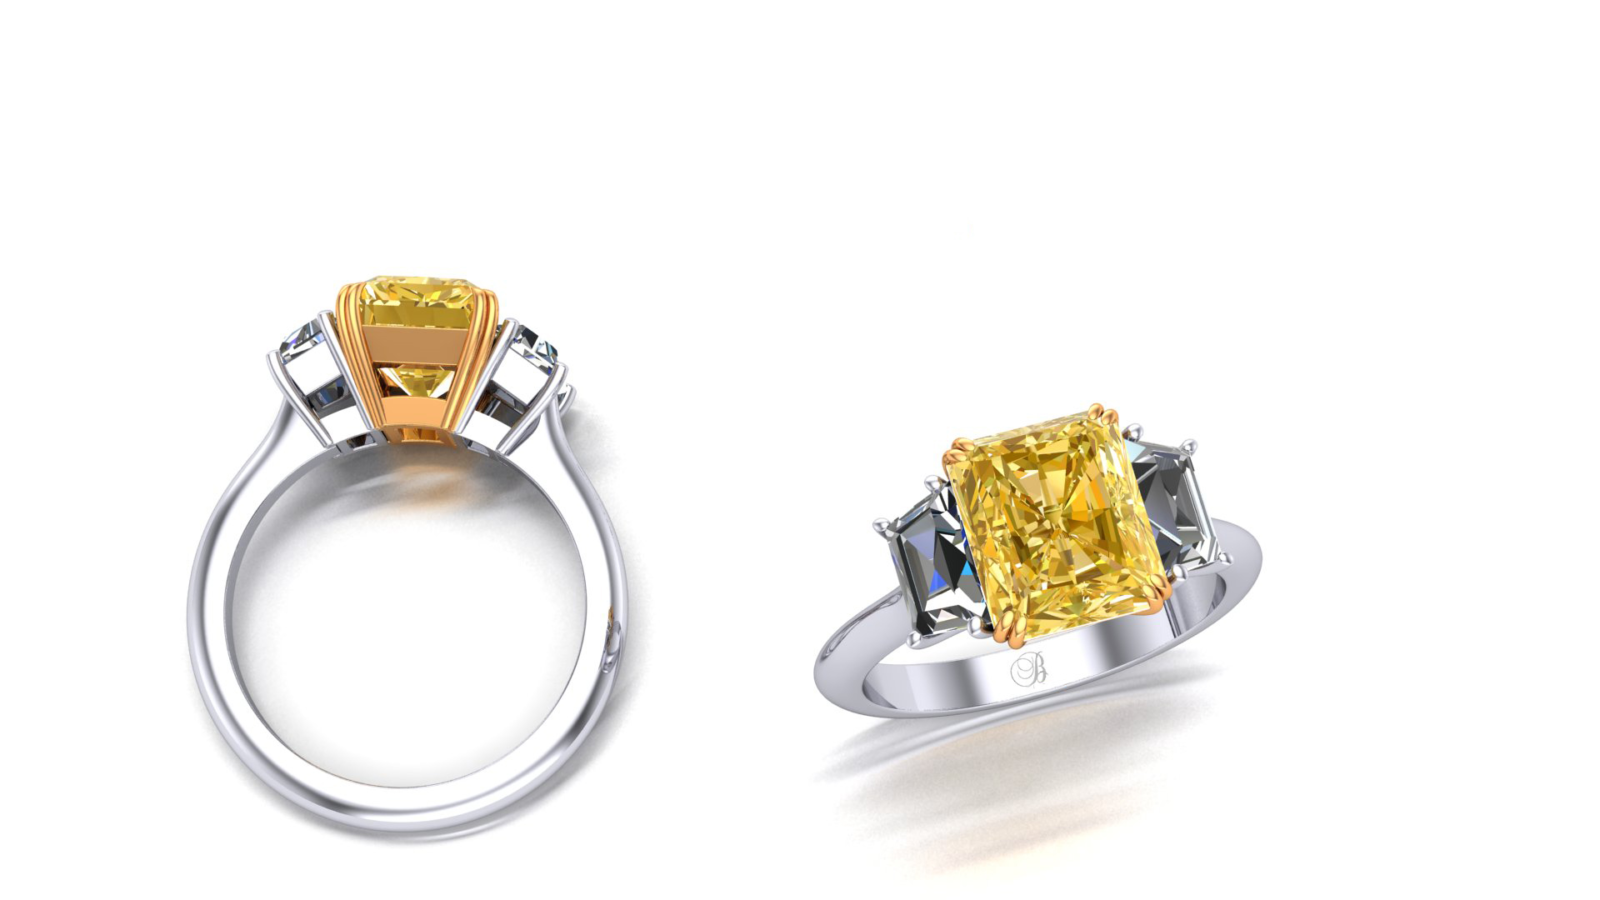 Boudreauxs Jewelers